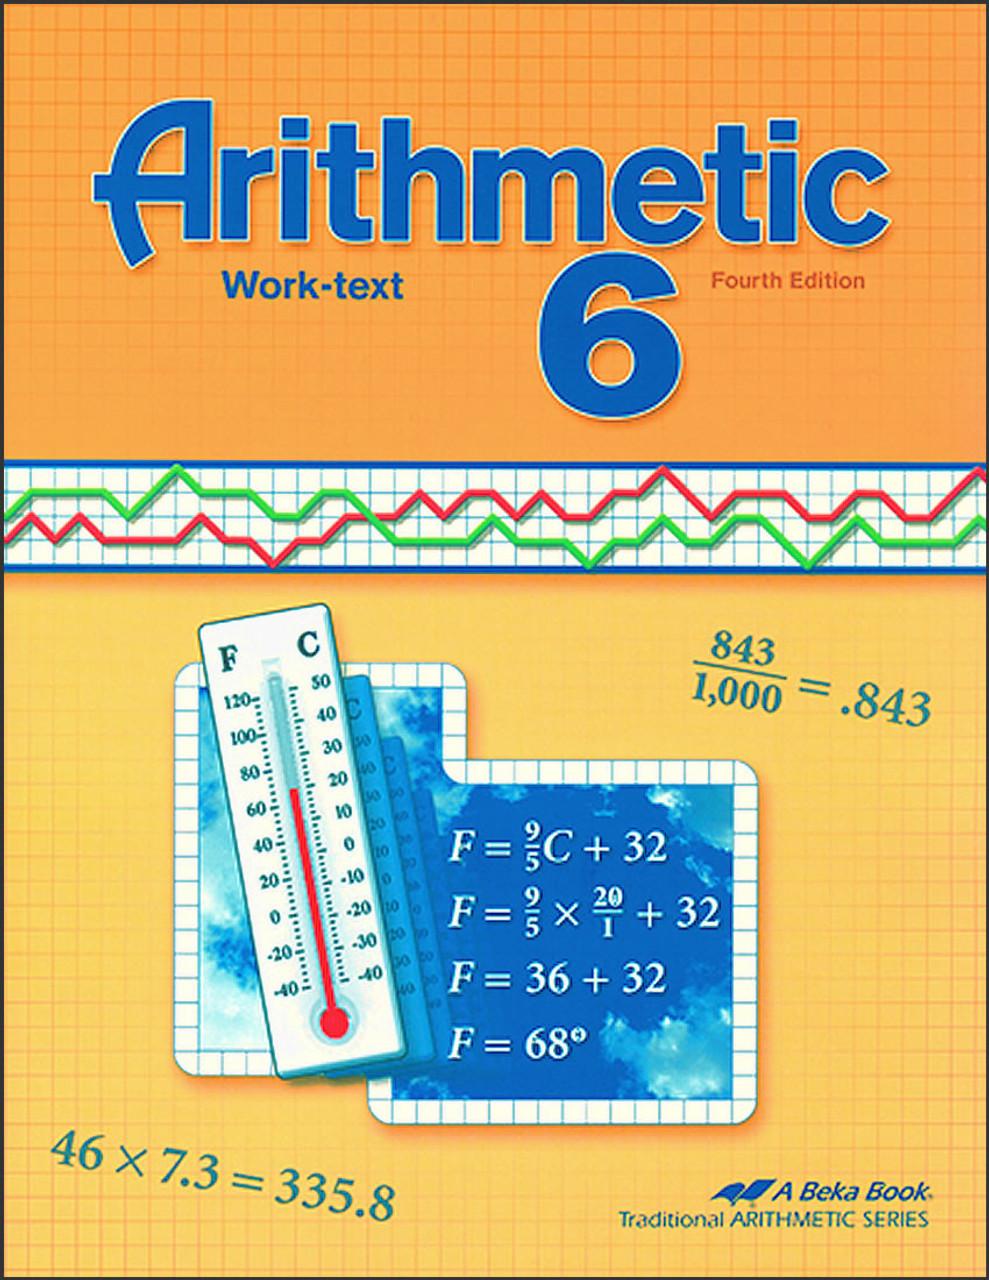 Arithmetic 6, 4th edition